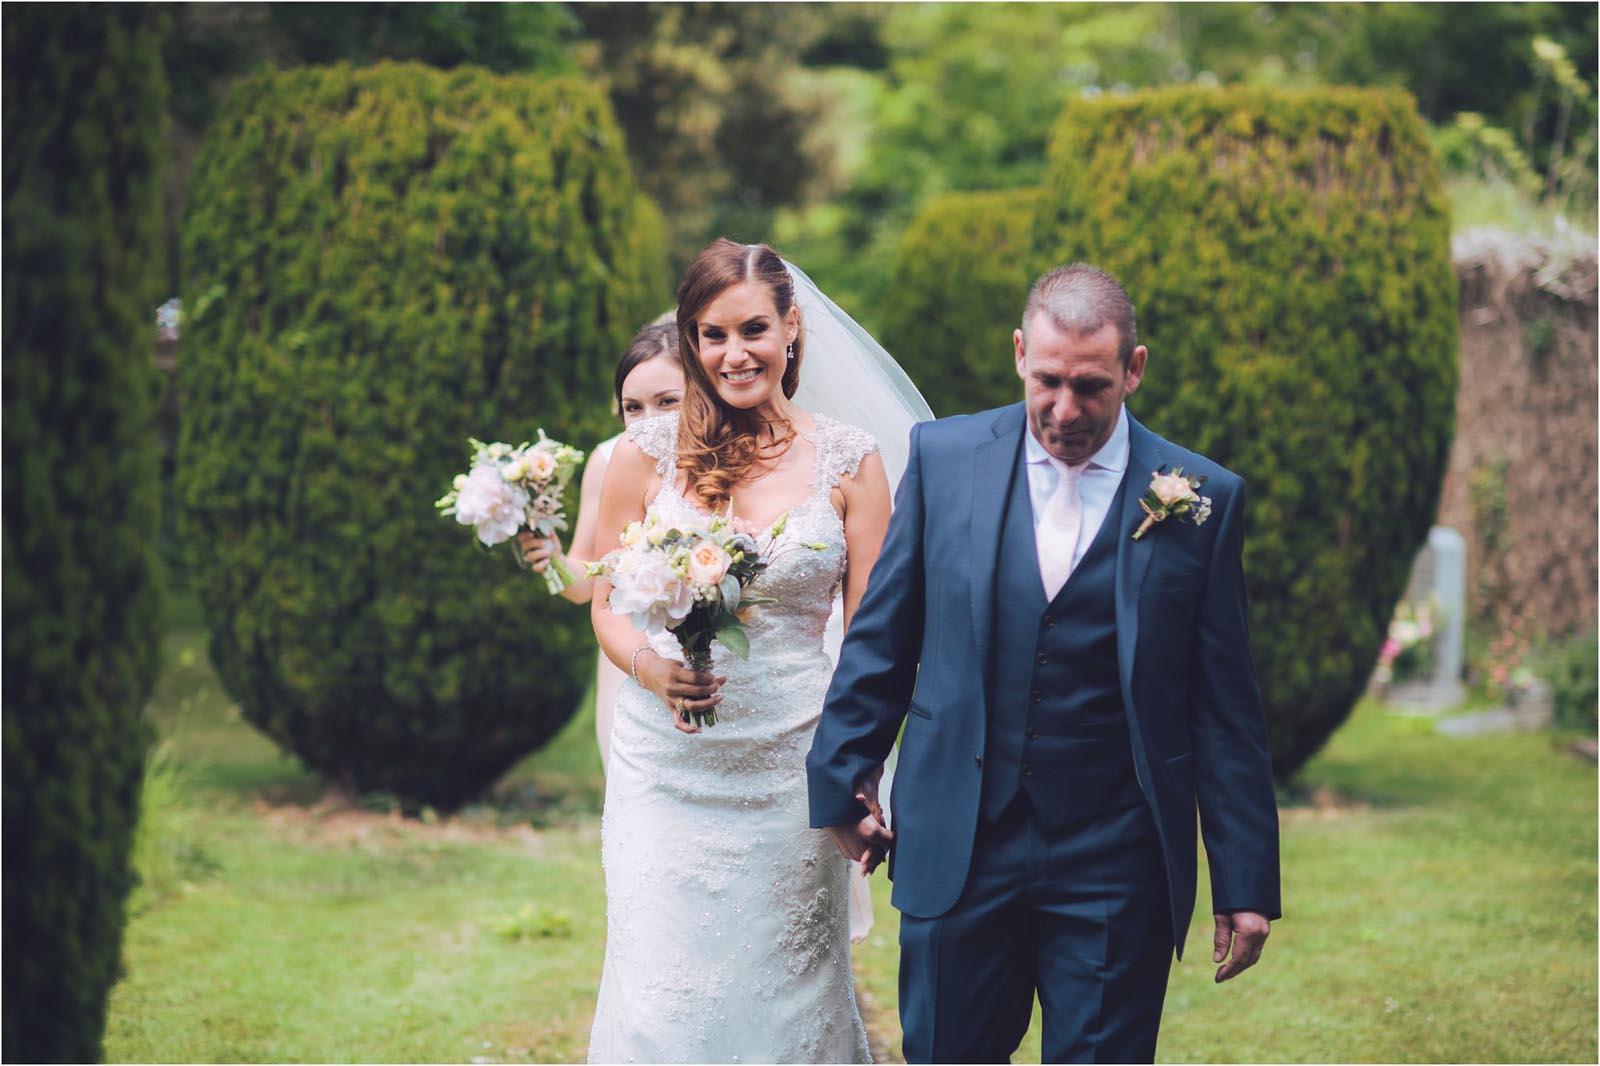 Simon biffen wedding photography 0058